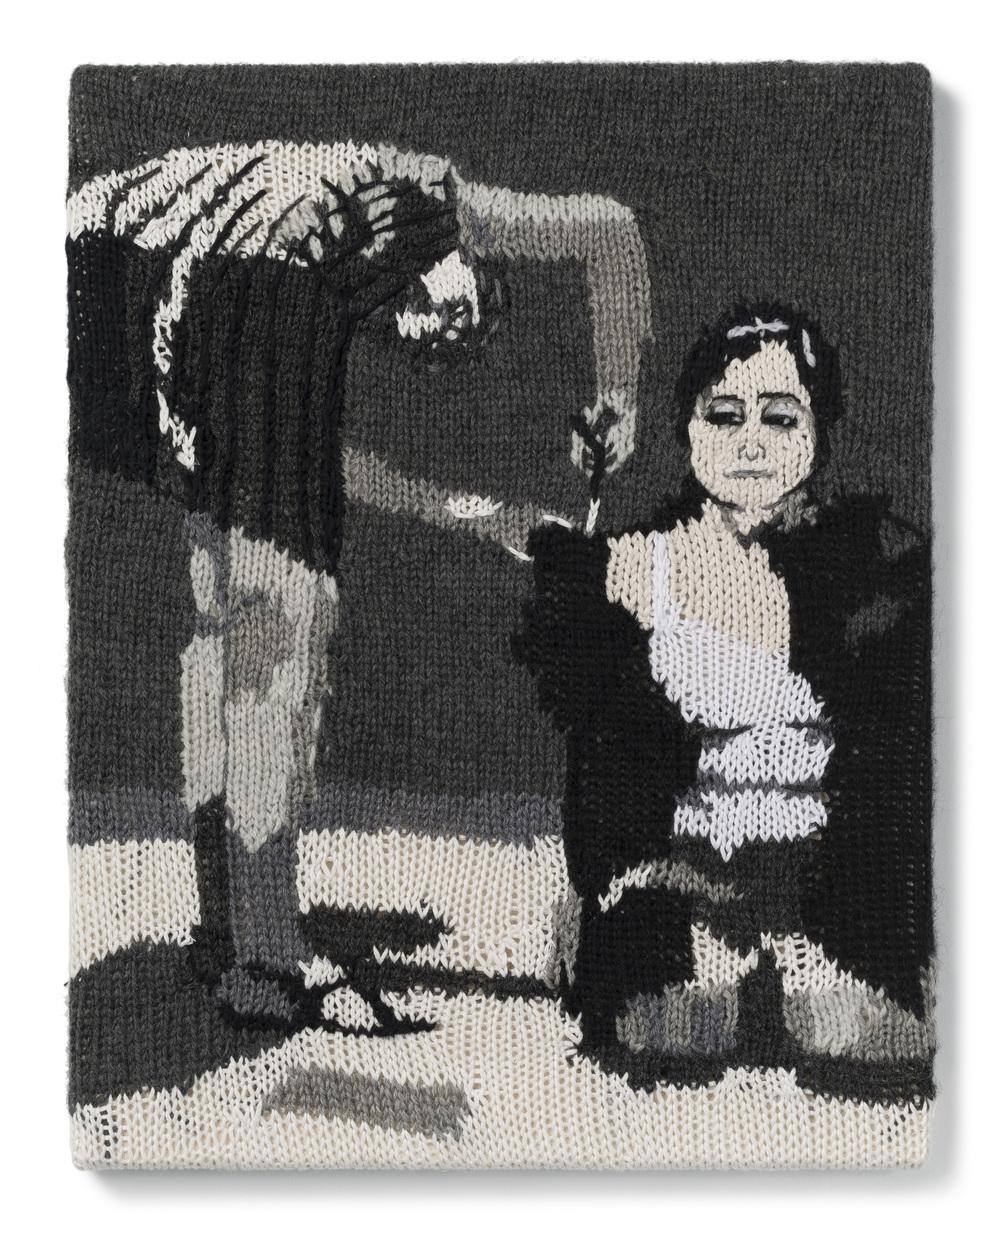 "Kate Just, Feminist Fan #18 (Yoko Ono, Cut Piece, 1965), 2016        Normal   0           false   false   false     EN-AU   JA   X-NONE                                                                                                                                                                                                                                                                                                                                                                           /* Style Definitions */  table.MsoNormalTable {mso-style-name:""Table Normal""; mso-tstyle-rowband-size:0; mso-tstyle-colband-size:0; mso-style-noshow:yes; mso-style-priority:99; mso-style-parent:""""; mso-padding-alt:0in 5.4pt 0in 5.4pt; mso-para-margin-top:0in; mso-para-margin-right:0in; mso-para-margin-bottom:10.0pt; mso-para-margin-left:0in; line-height:115%; mso-pagination:widow-orphan; font-size:11.0pt; font-family:""Calibri"",""sans-serif""; mso-ascii-font-family:Calibri; mso-ascii-theme-font:minor-latin; mso-hansi-font-family:Calibri; mso-hansi-theme-font:minor-latin; mso-fareast-language:EN-US;}"